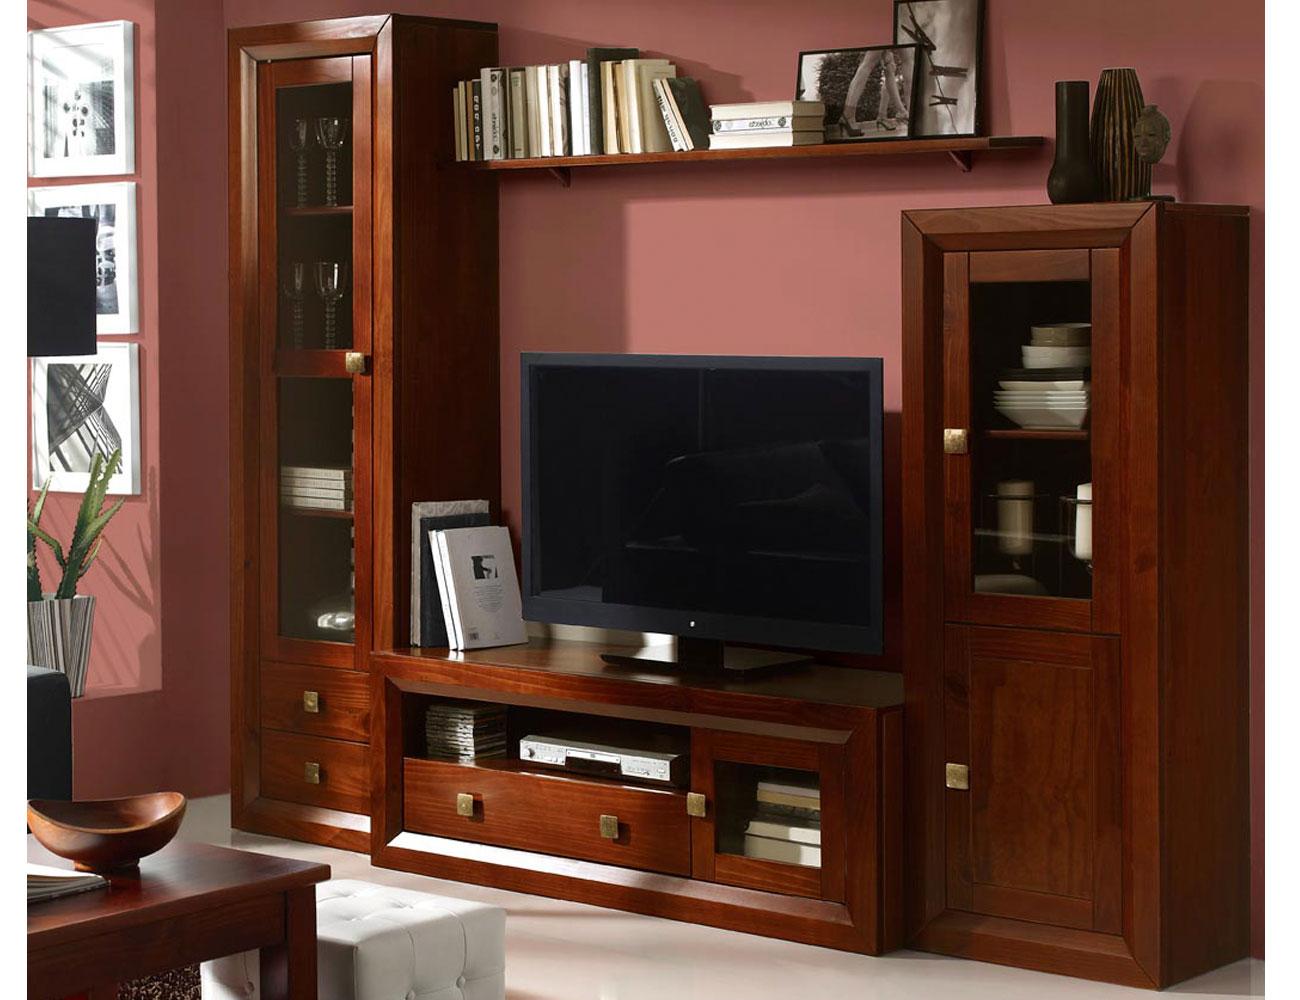 Muebles salon comedor nogal madera dm vitrina bodeguero tv1